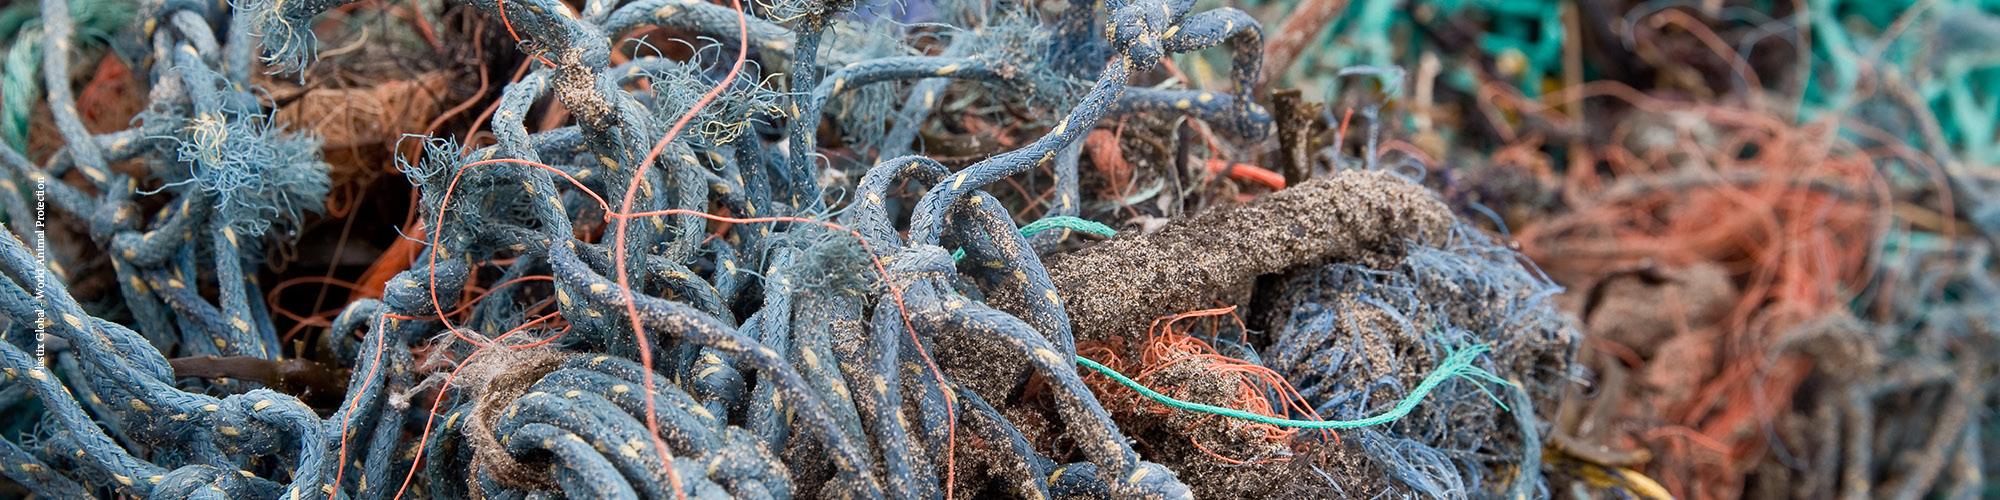 Oceano Plástico: lixo marinho e impacto na vida animal